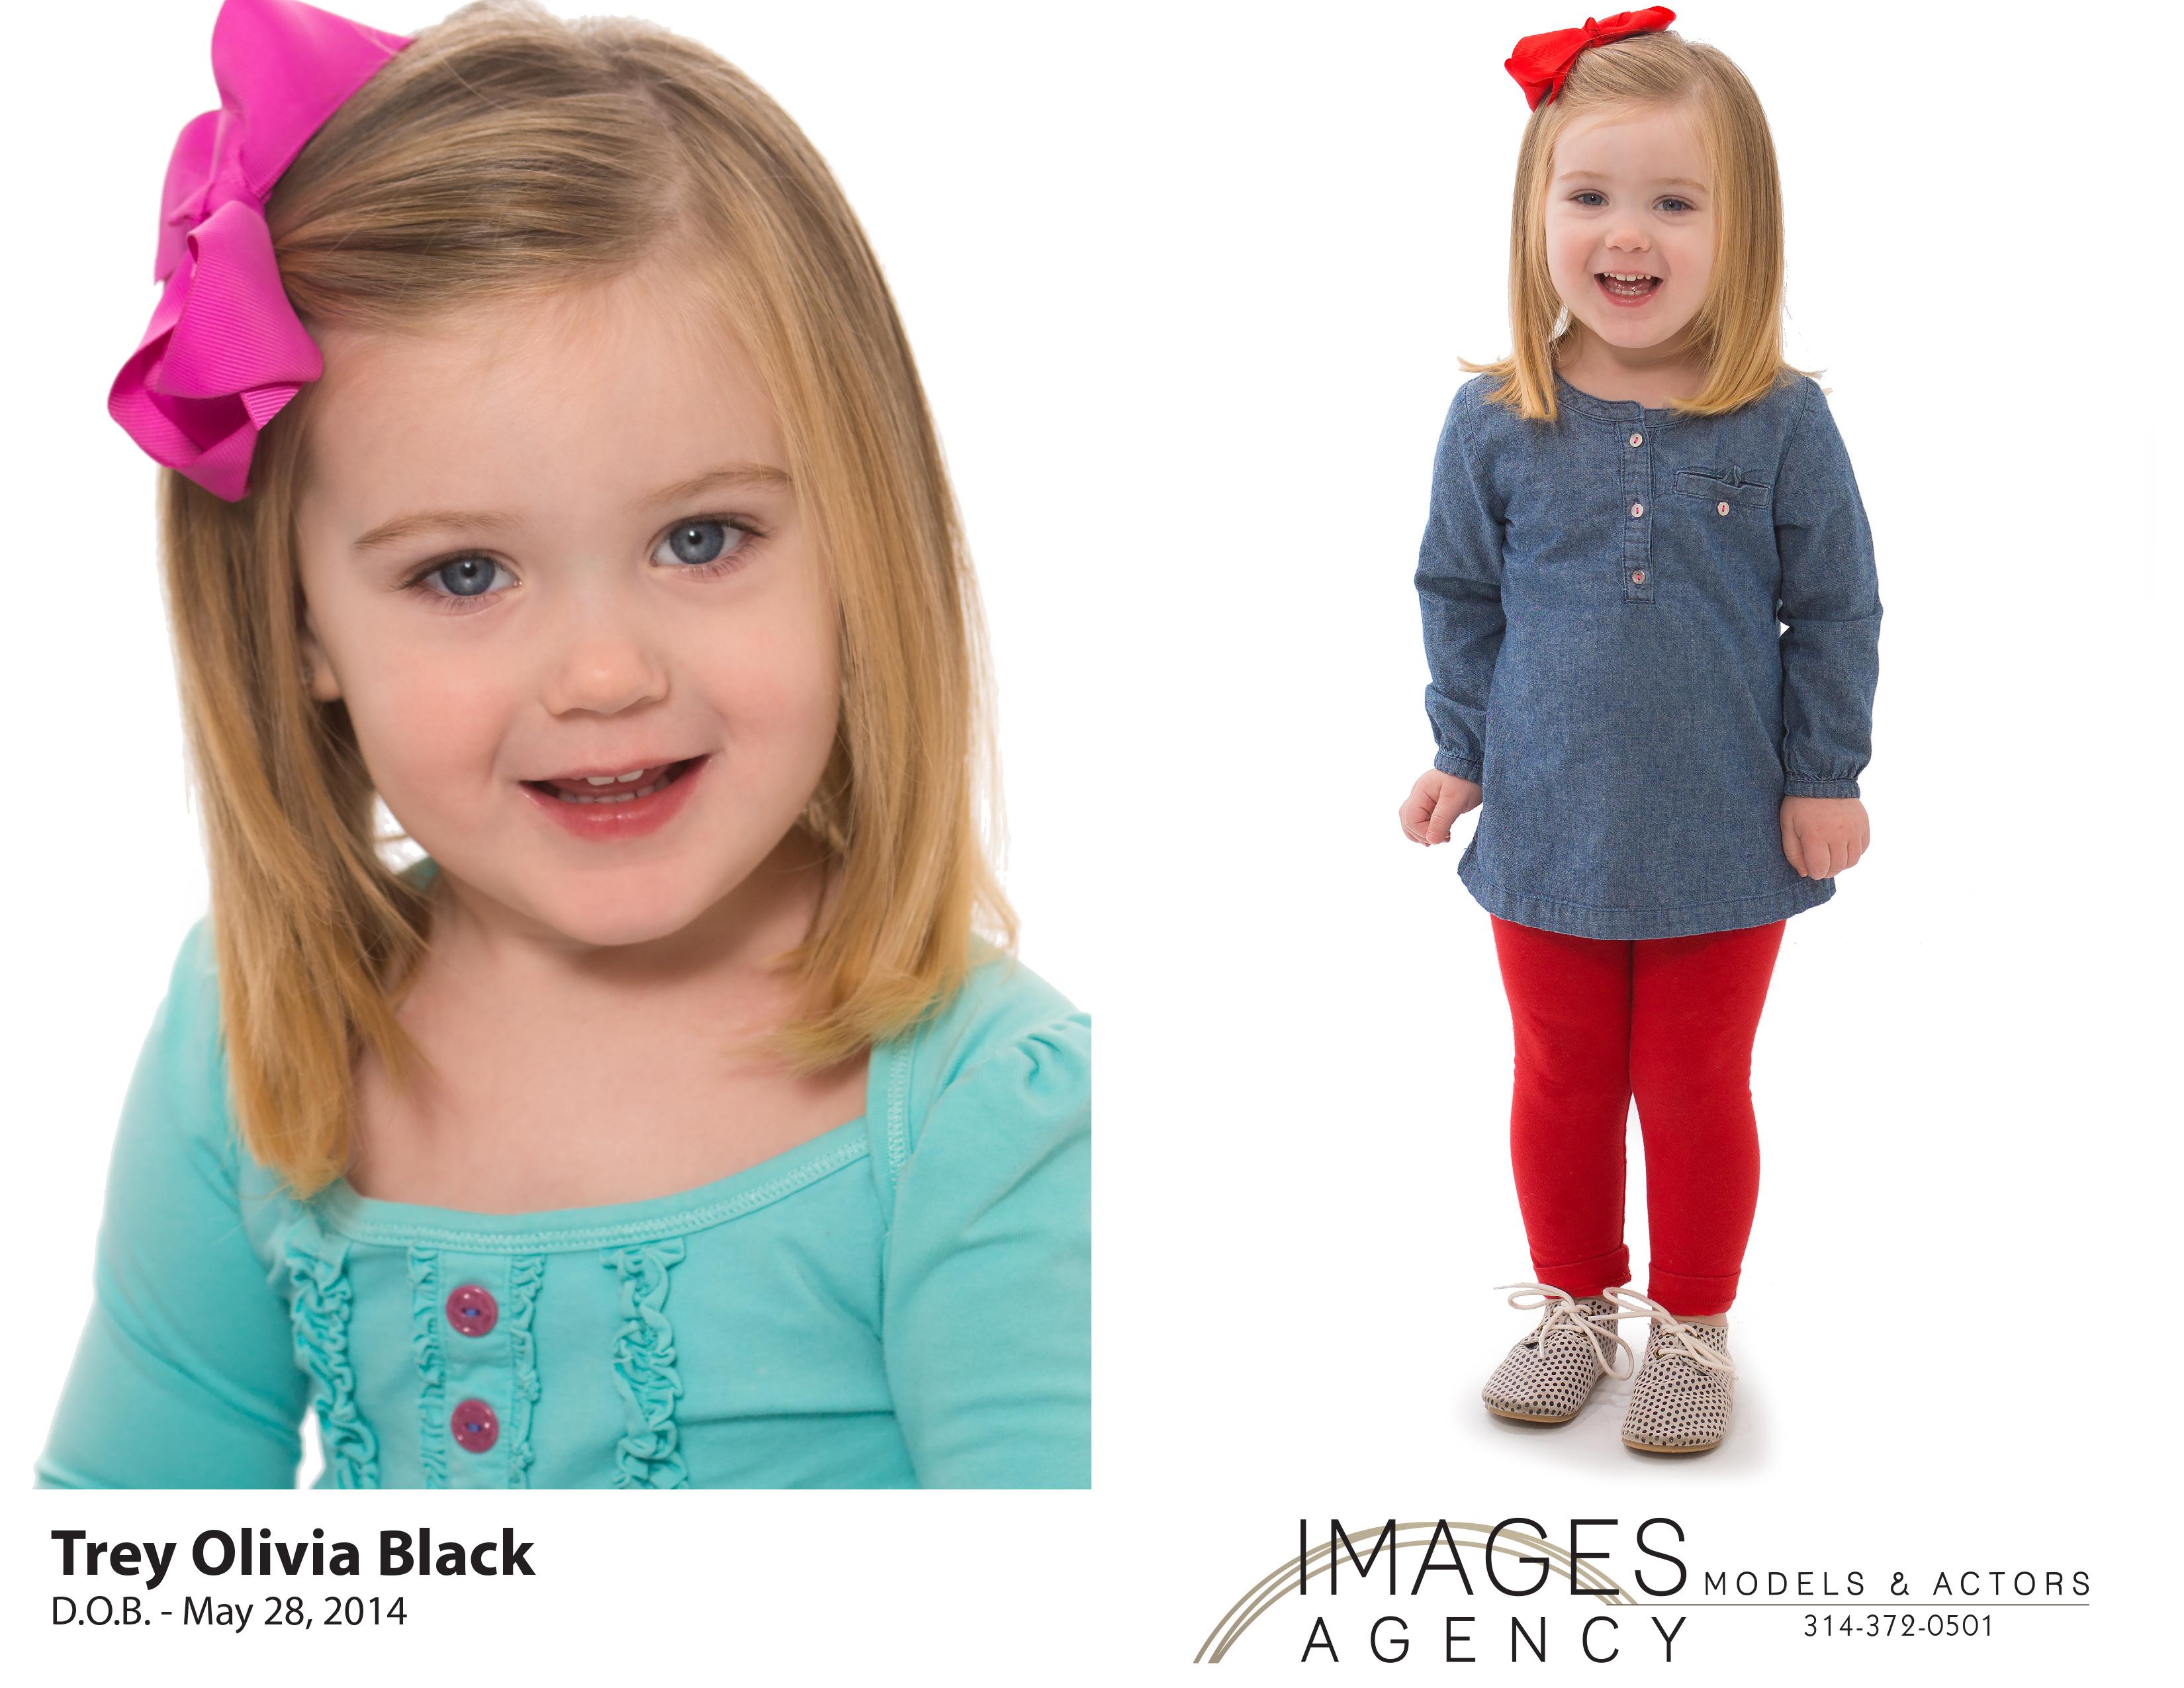 Trey Olivia Black